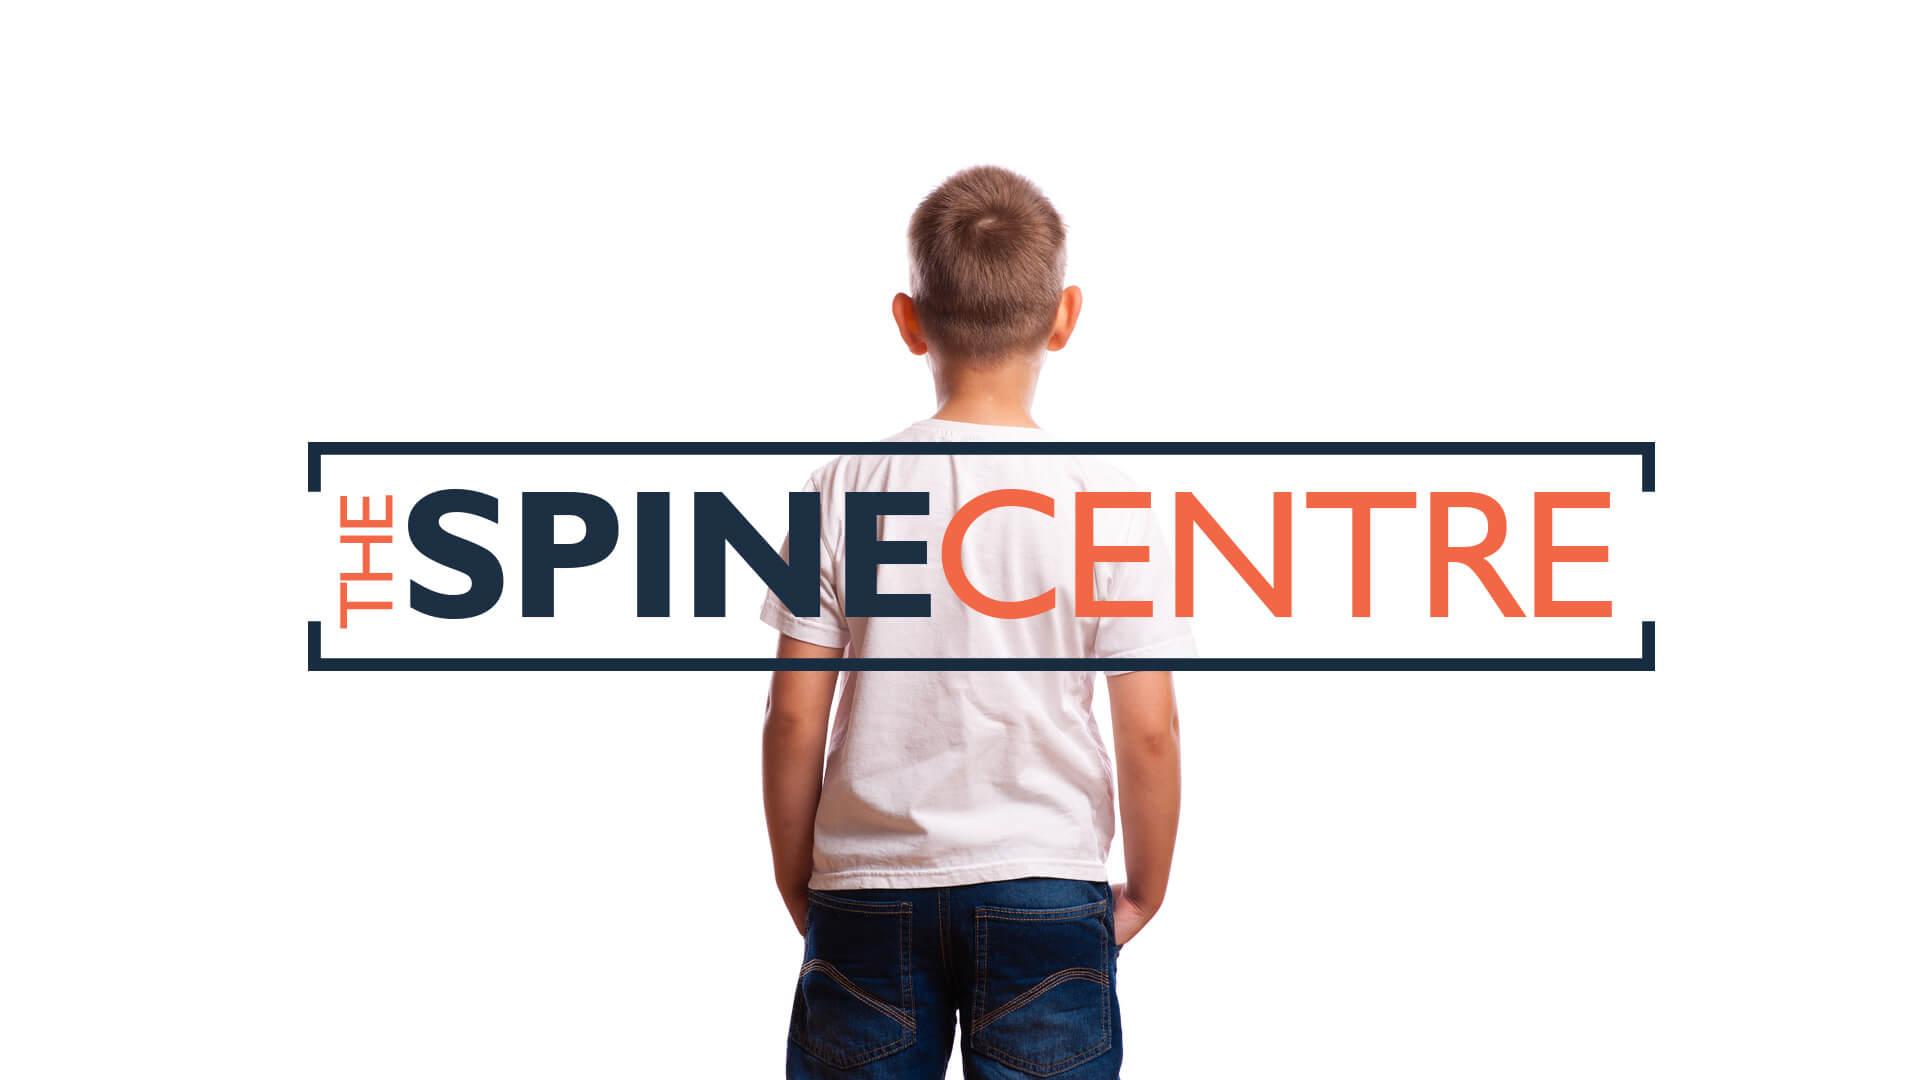 Spine Centre Chiropractic Slider Image 4